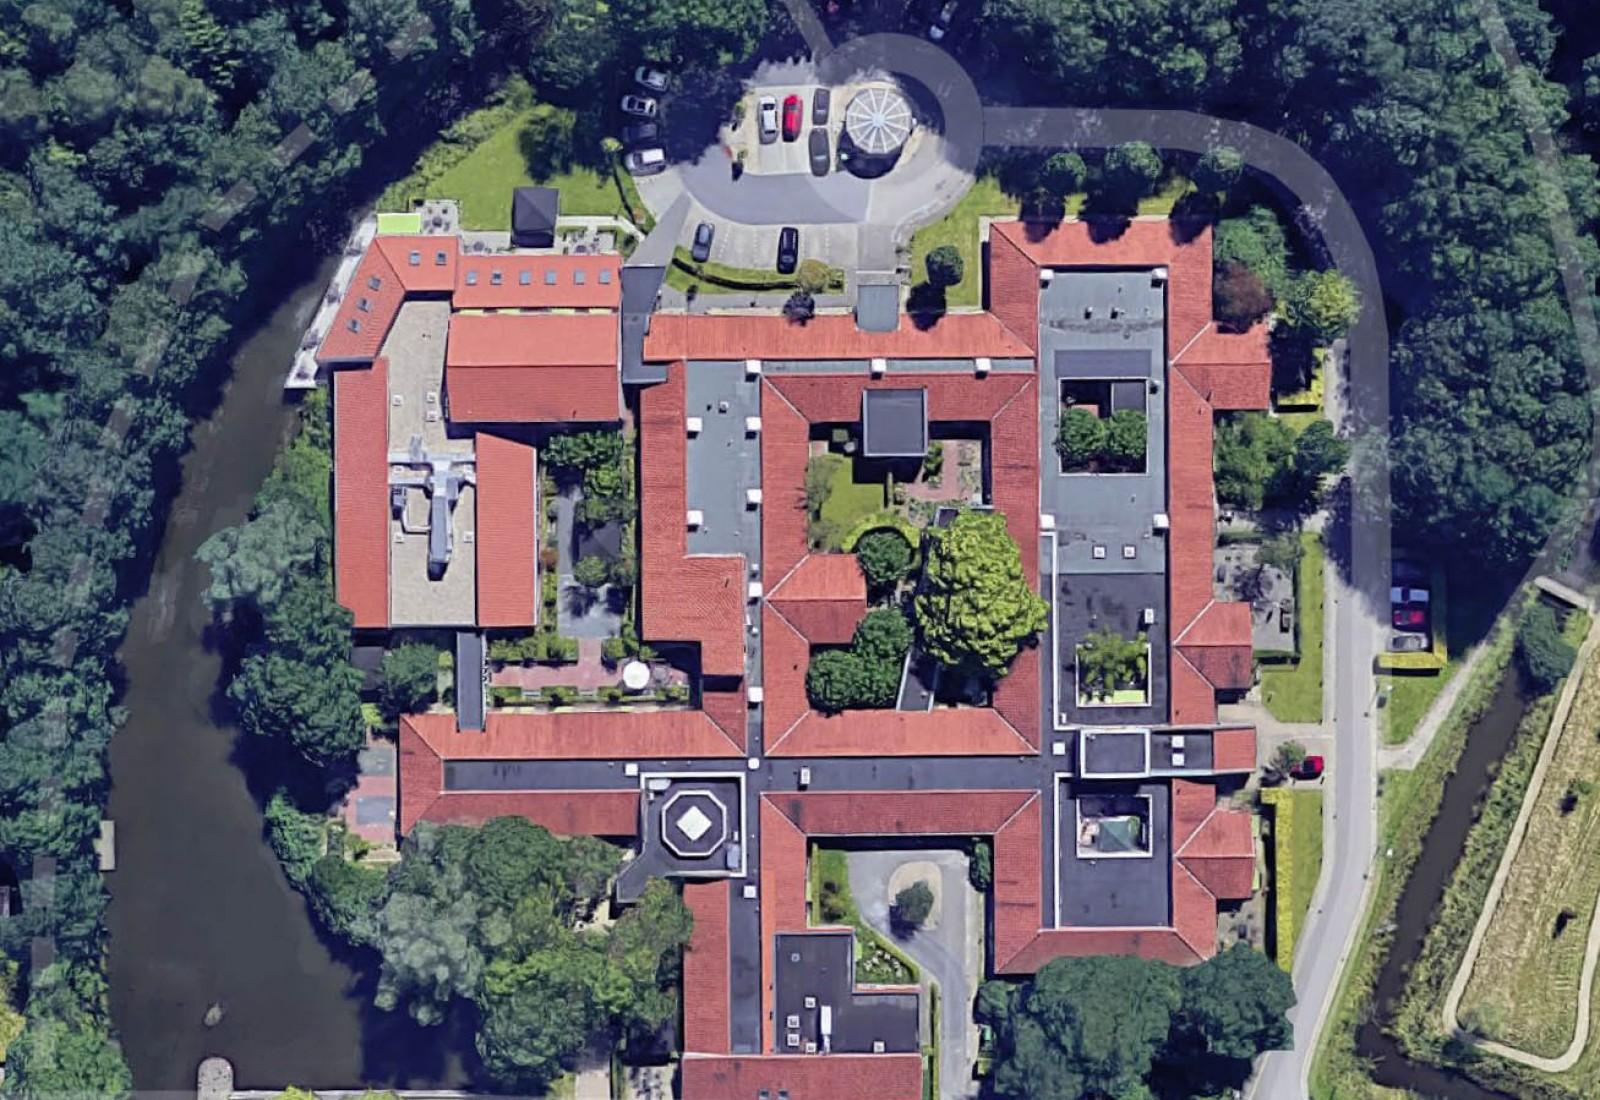 Thumbnail for Renovatie Huis 3 Mediant GGZ Enschede